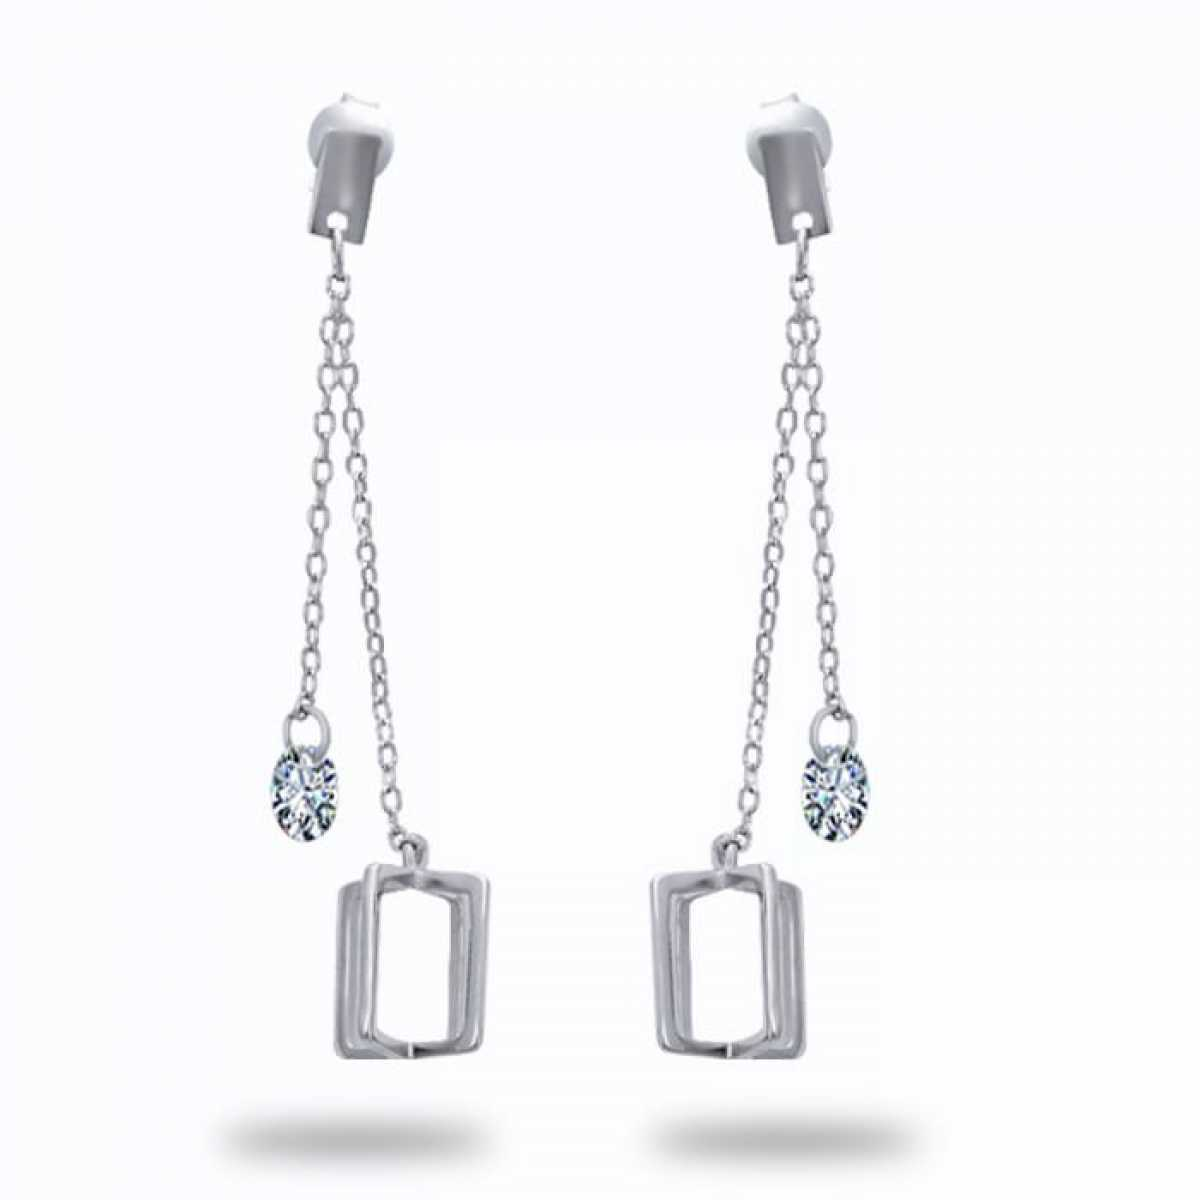 New Desine Silver Earring